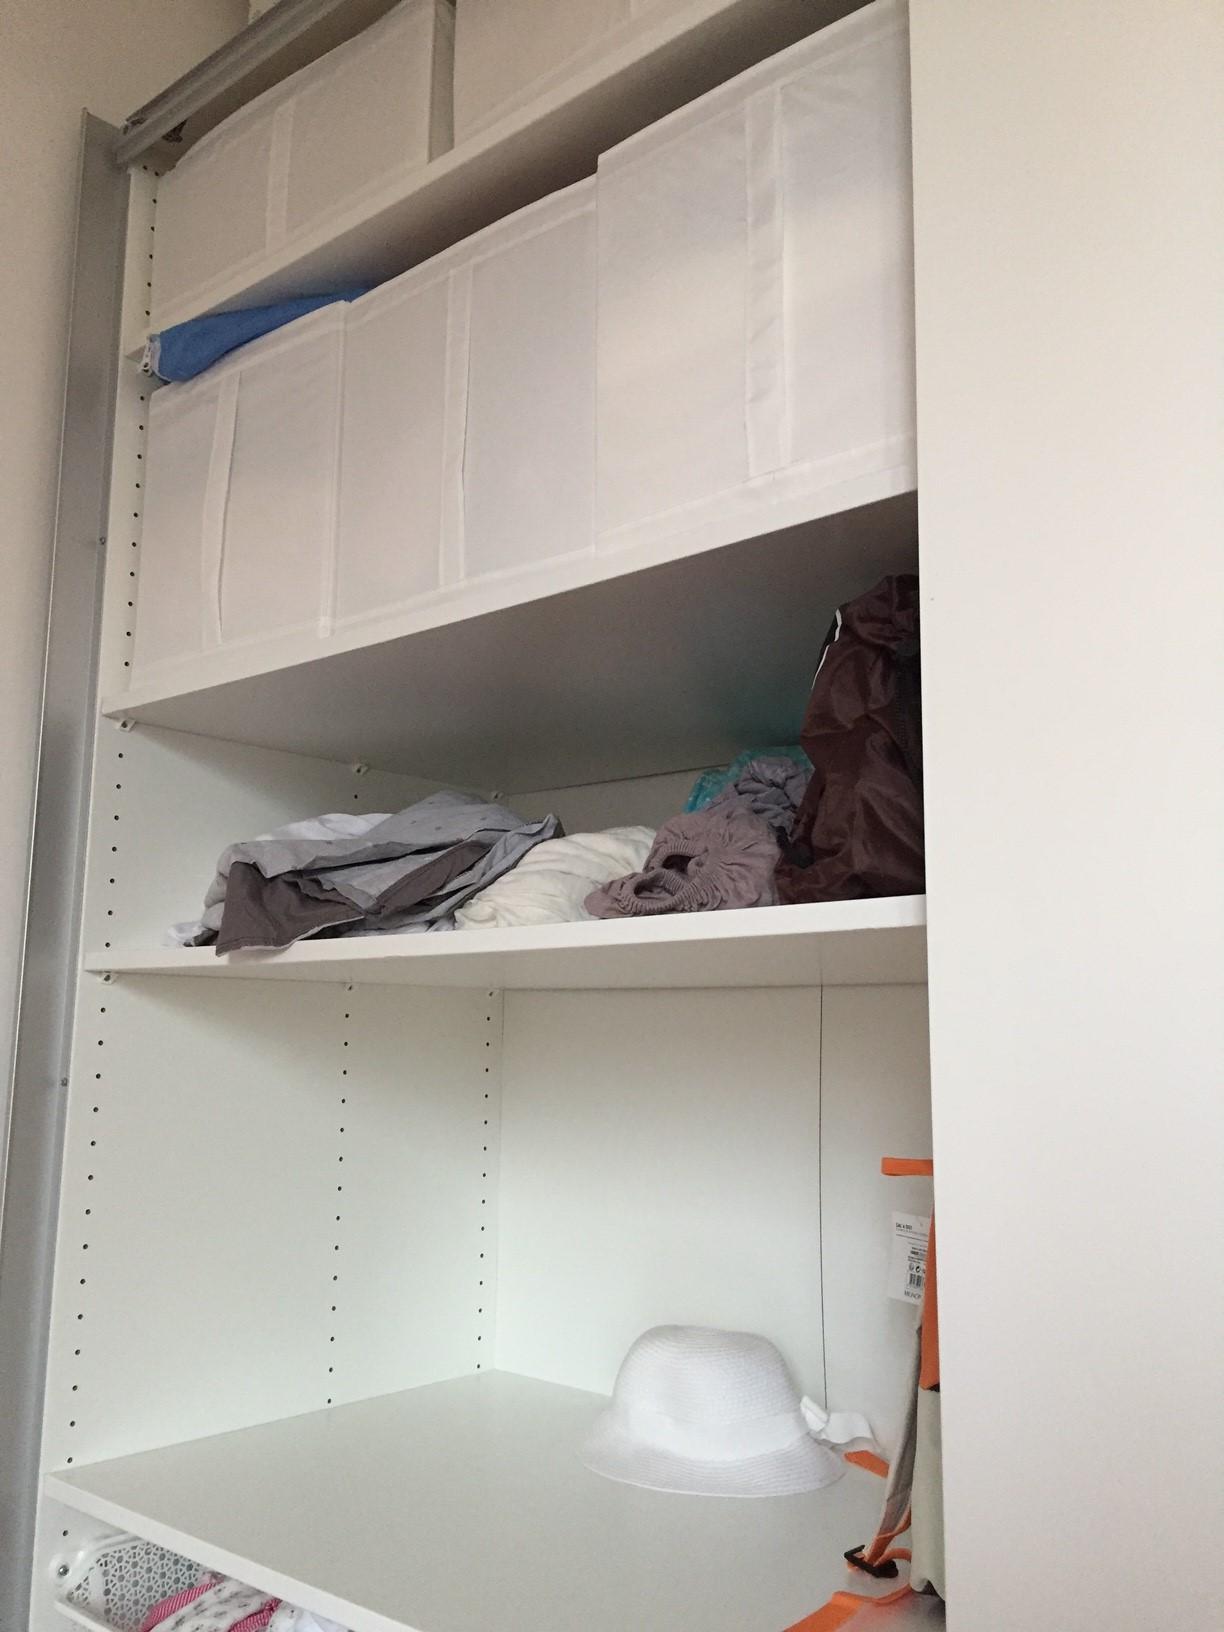 nouvelle armoire ikea enfant id e pmgirl. Black Bedroom Furniture Sets. Home Design Ideas